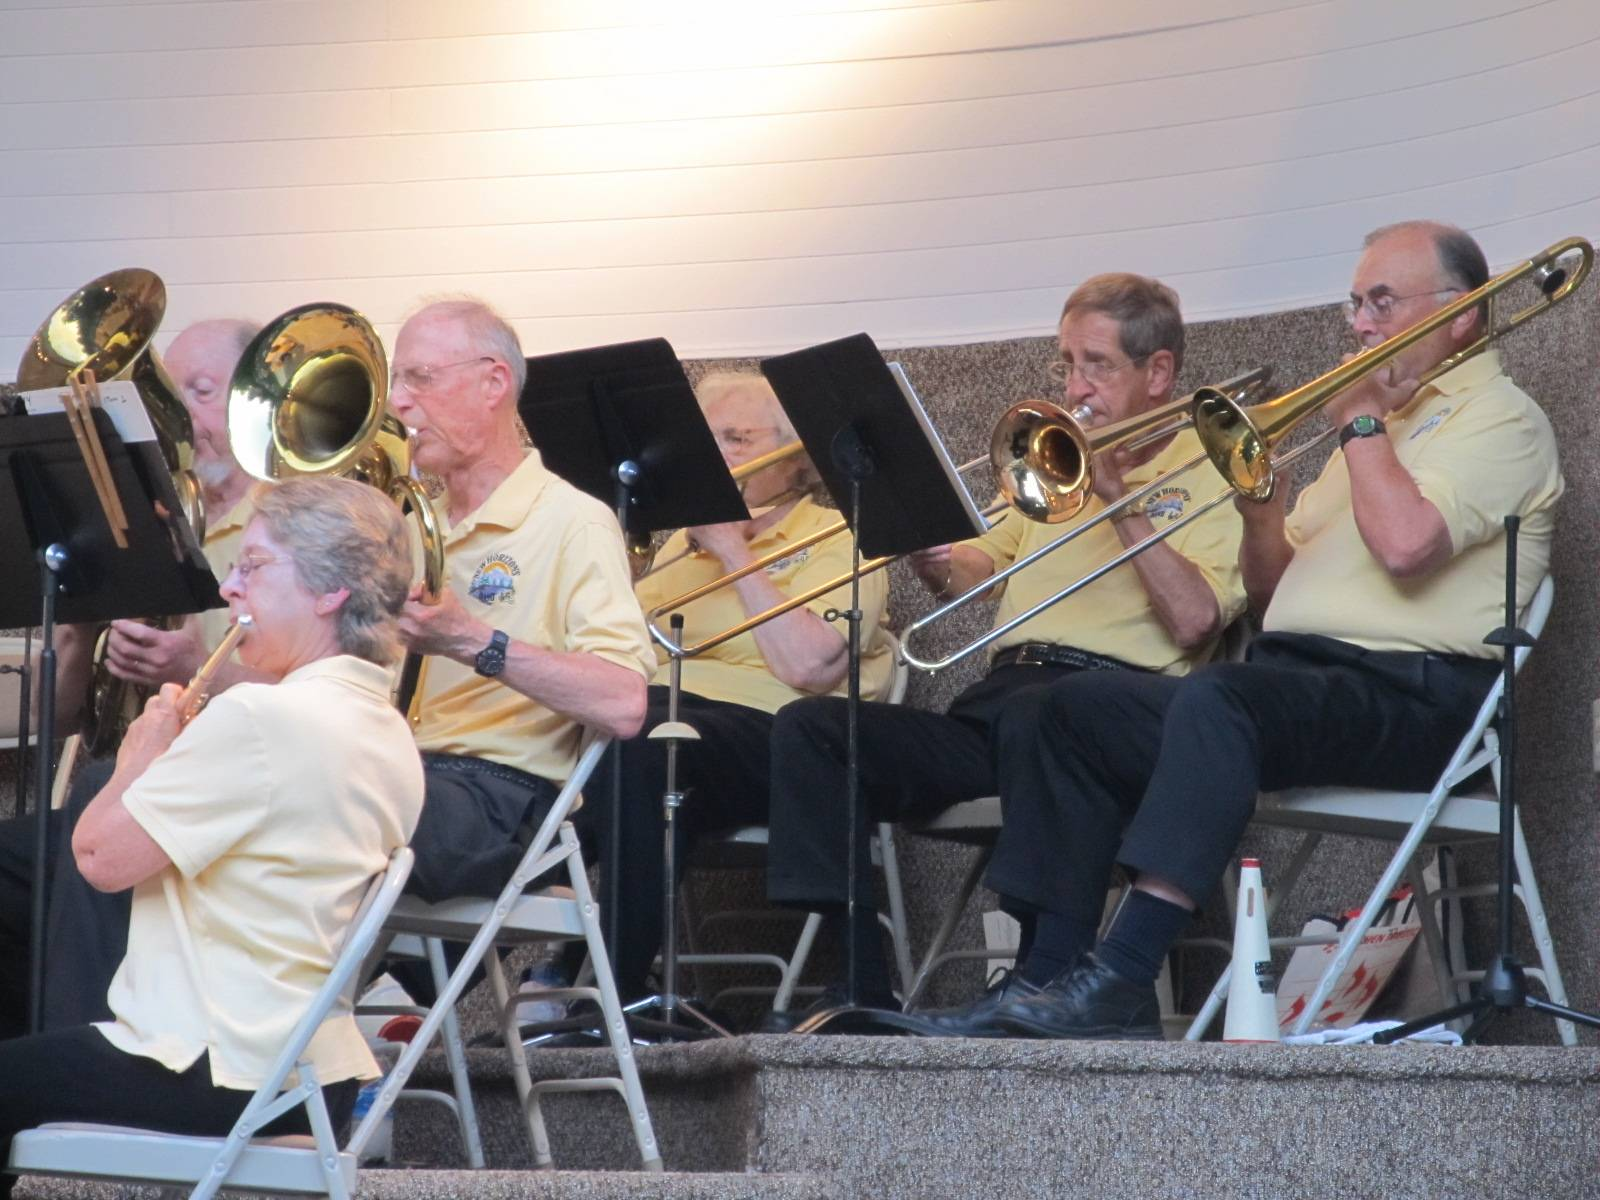 Baritone and Trombone Section